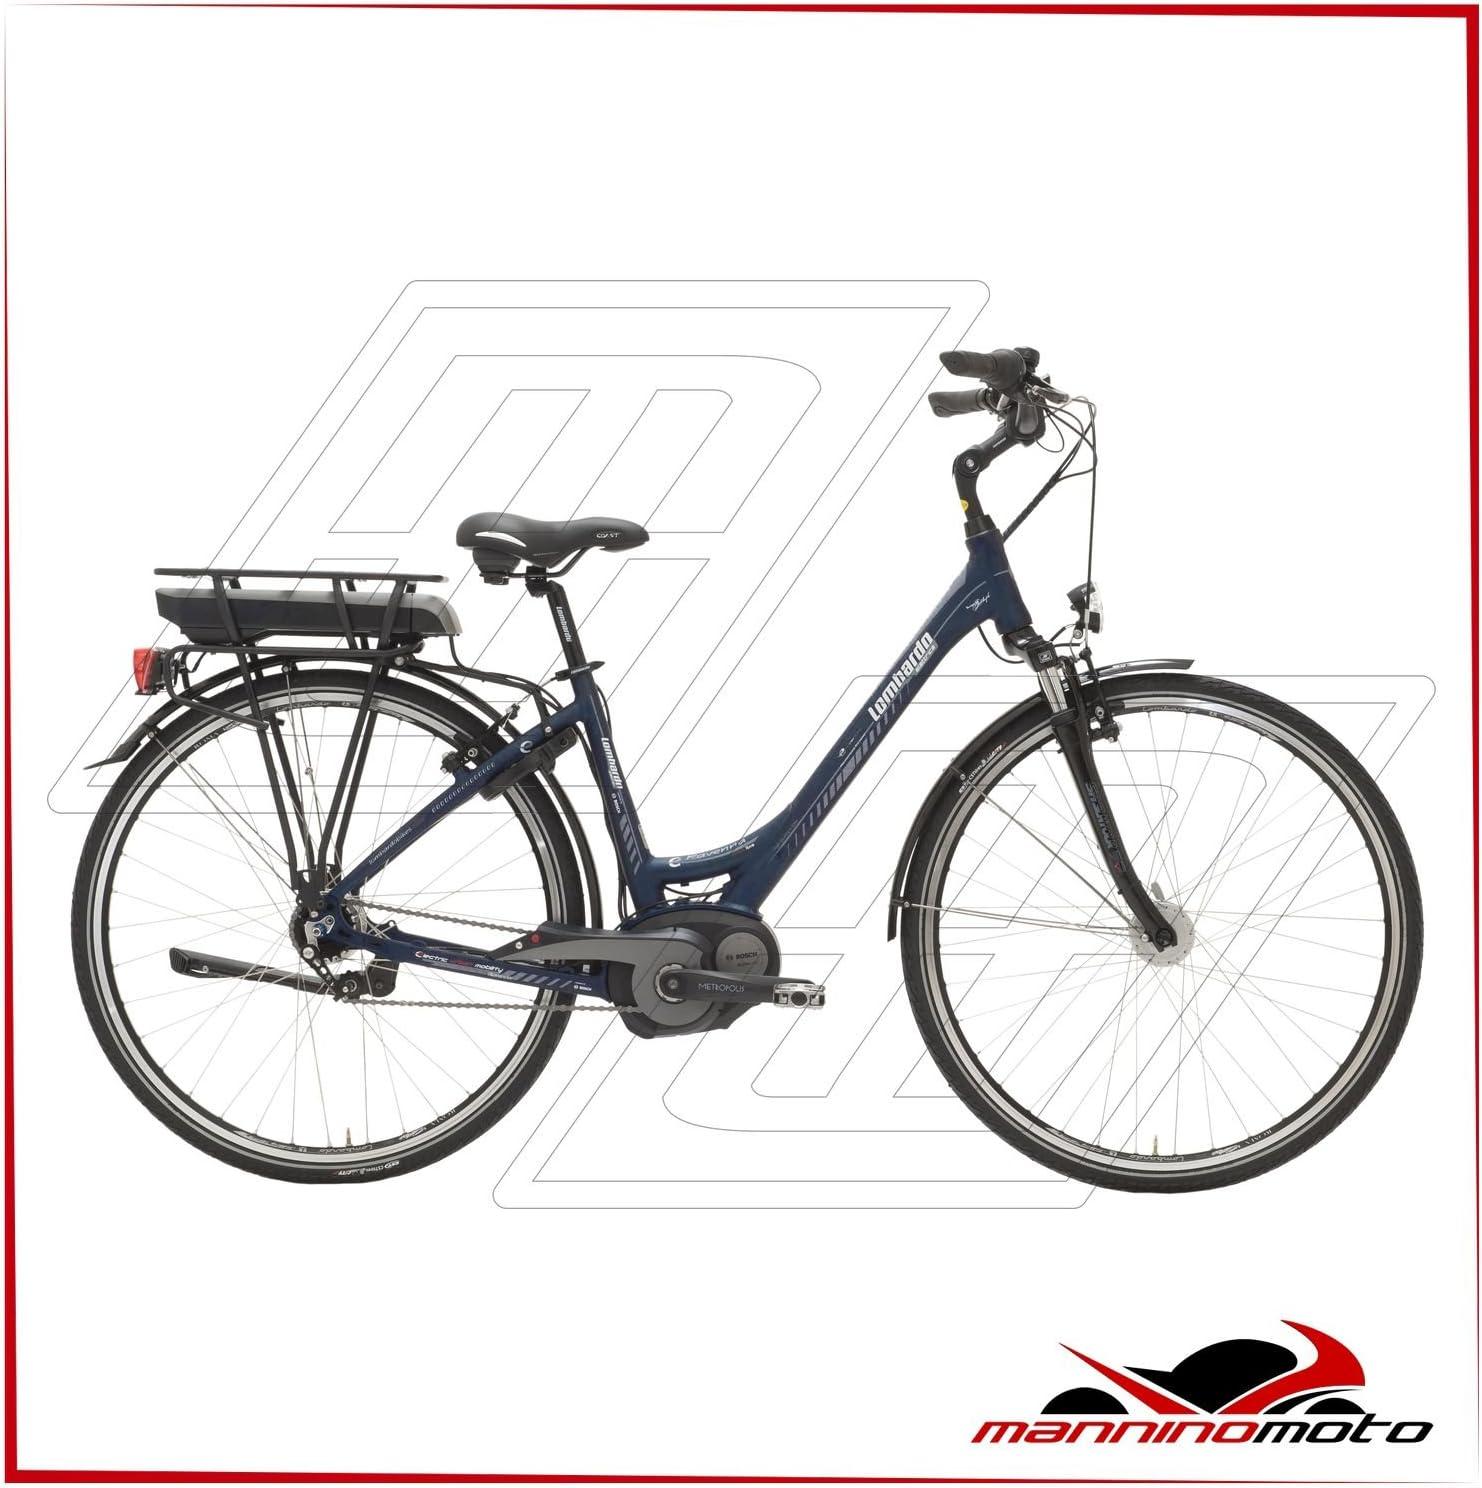 Bicicleta eléctrica Lombardo 28 e-ravenna Classic Motor Bosch Active – 400 Wh – 2017, BLU,BIANCA: Amazon.es: Deportes y aire libre